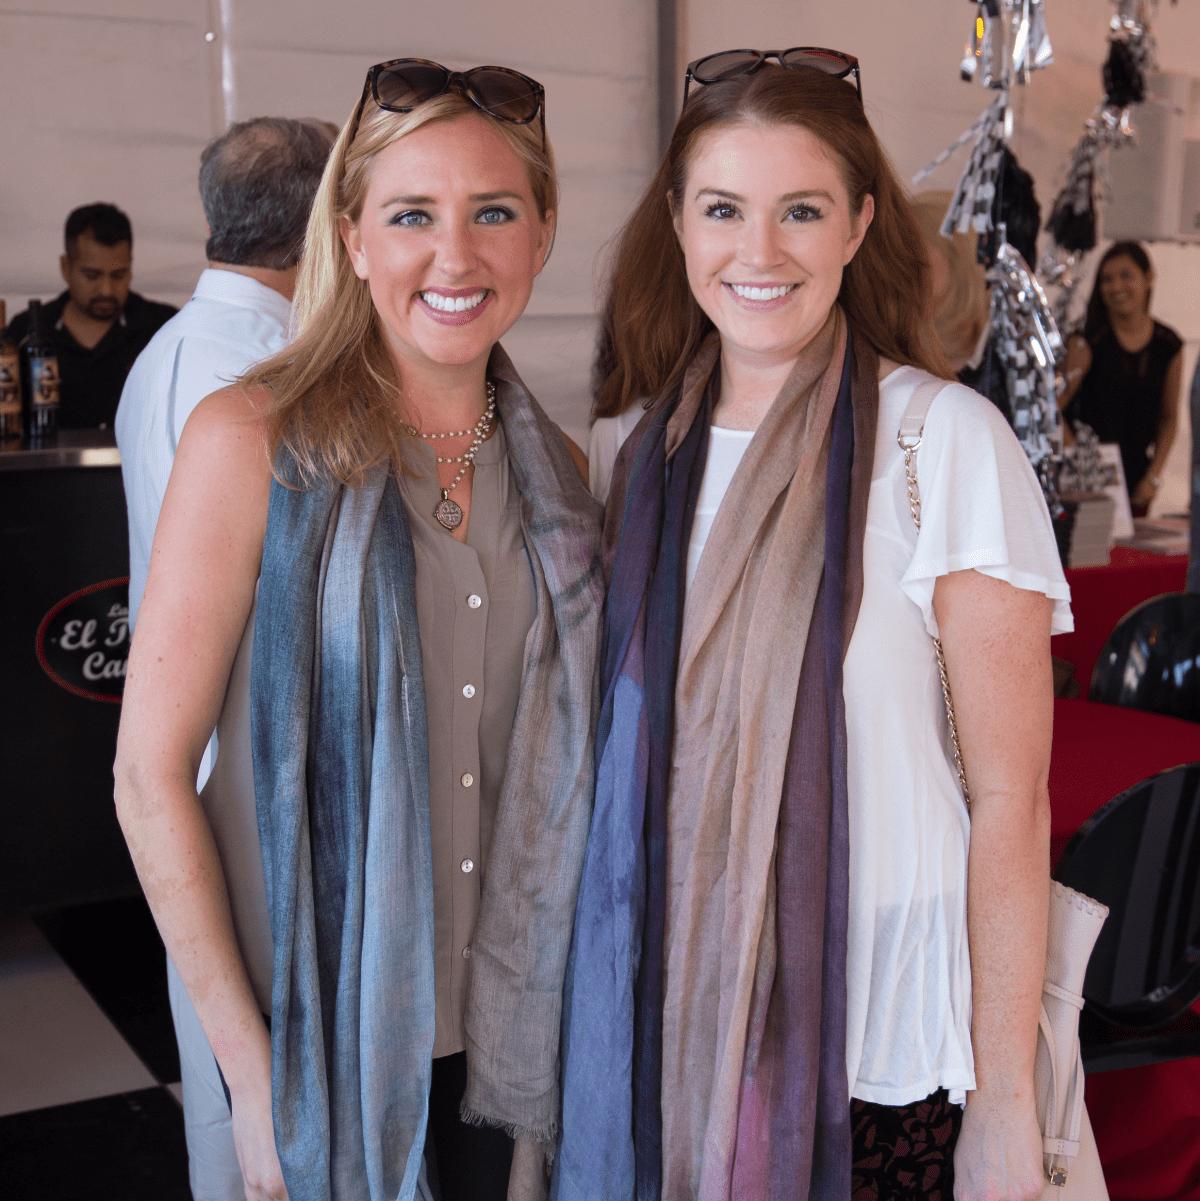 Houston, Mica Mosbacher Racing Forward event, October 2015, Emily Shuffield Hanley, Trevor Thompson